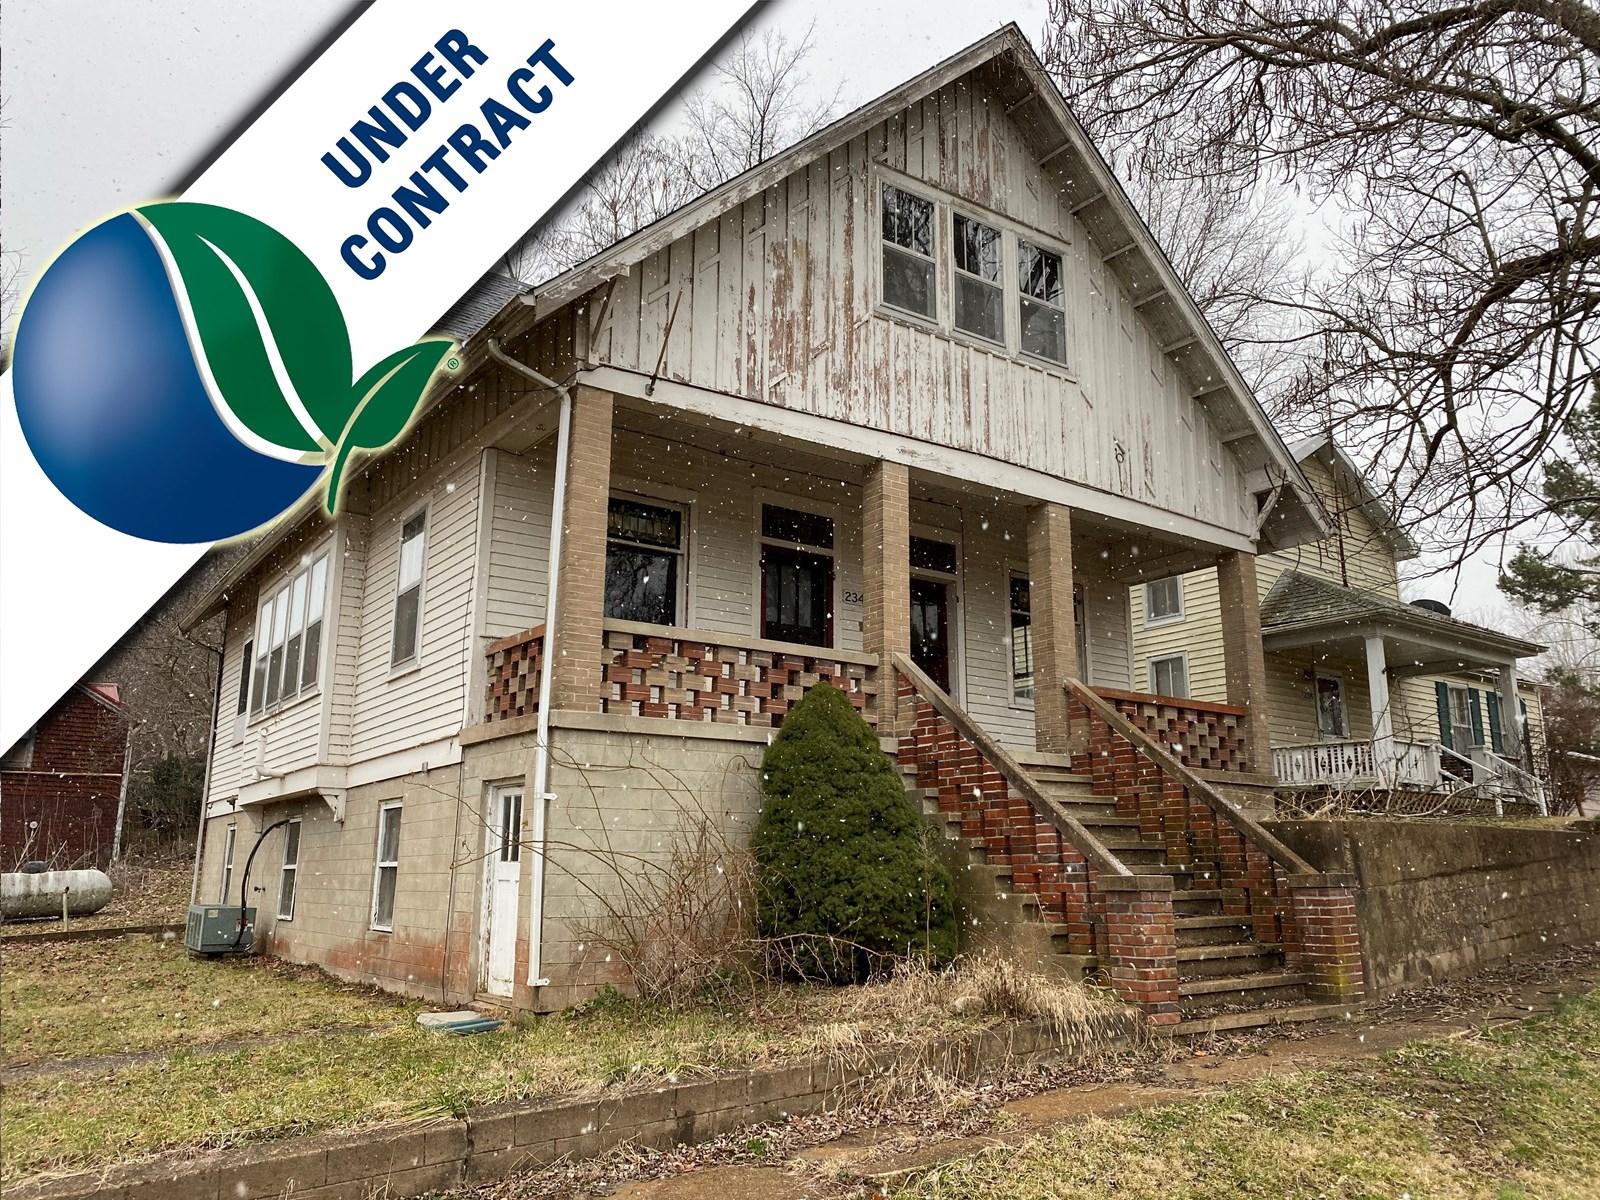 Historic Fixer-Upper Home for sale near Hermann, Missouri